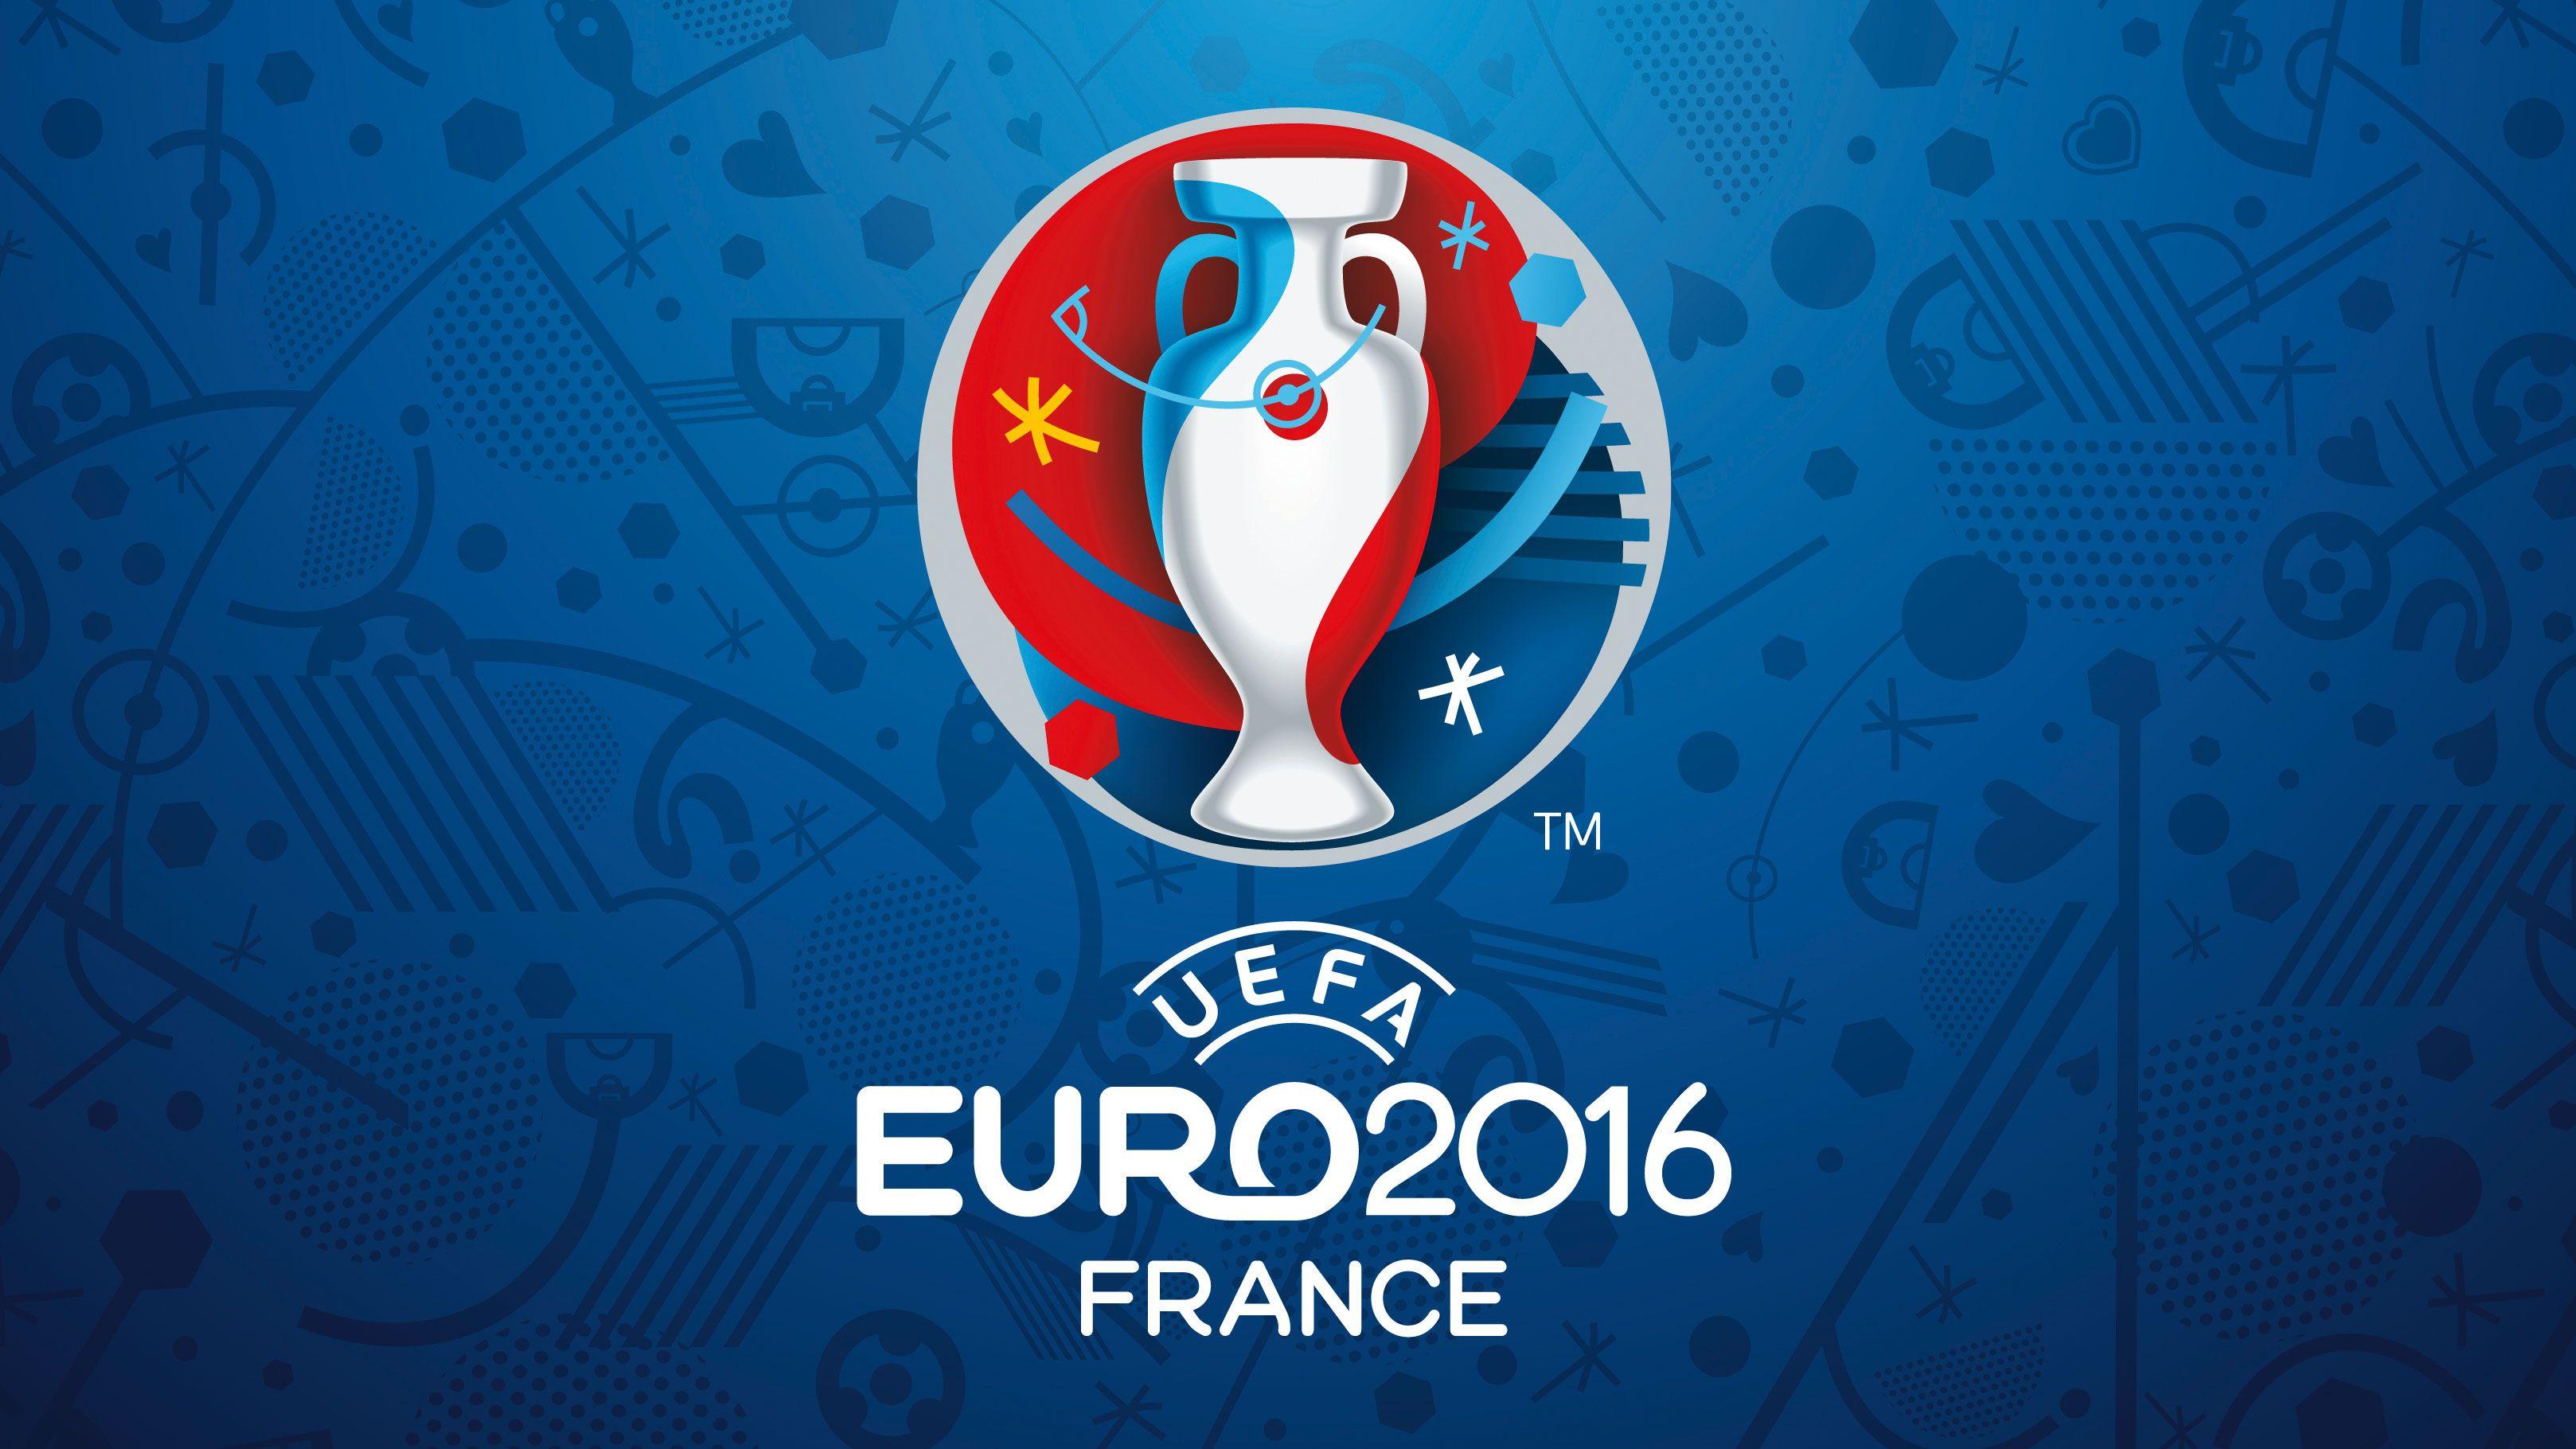 The Secrets Behind The Euro 2016 Branding Euro 2016 Uefa Euro 2016 Euro